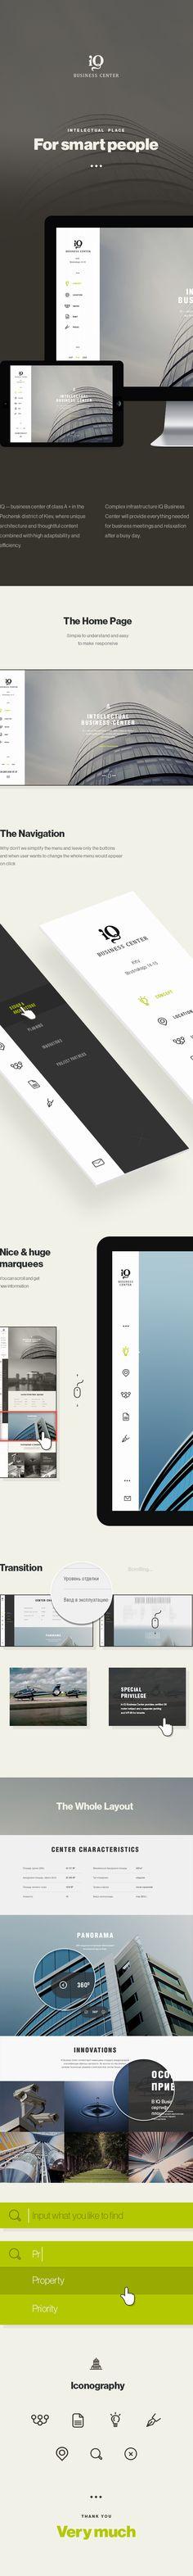 IQBC Responsive Concept by Dima Shvedun, via Behance - Nice vertical navigation